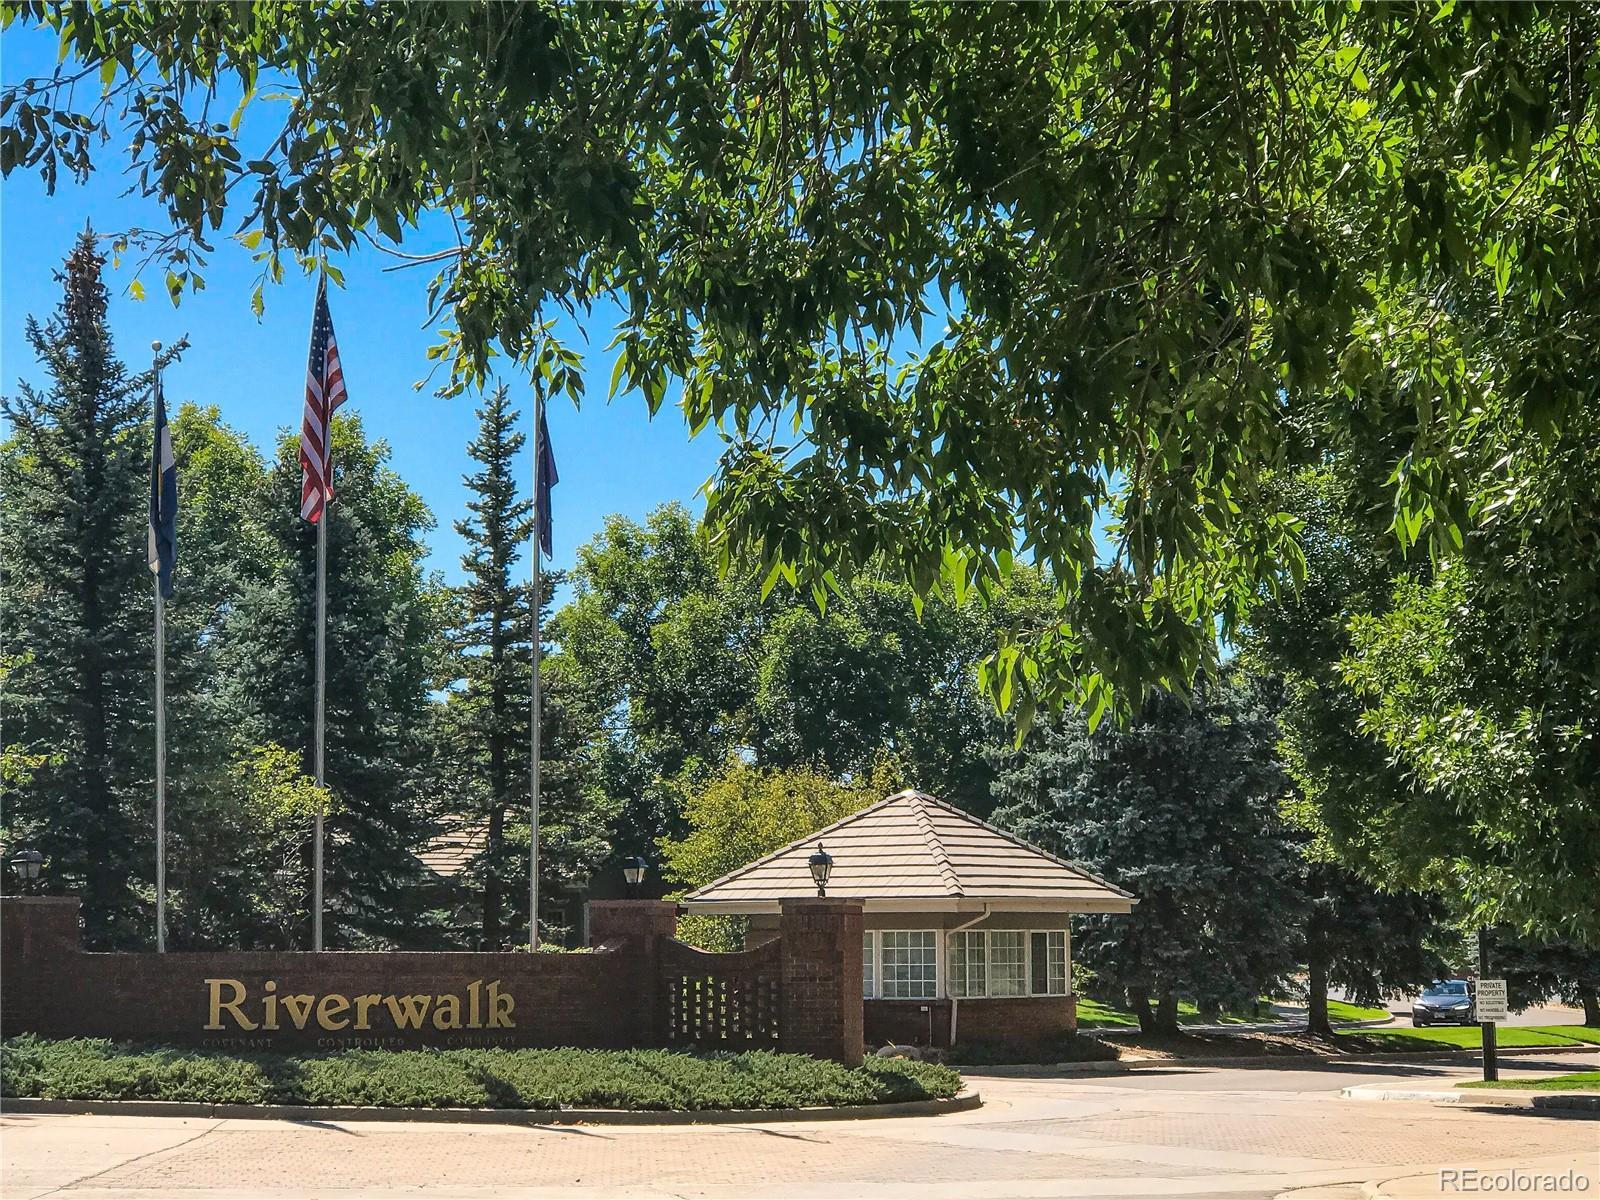 MLS# 3727022 - 3 - 2767 W Riverwalk Circle #G, Littleton, CO 80123